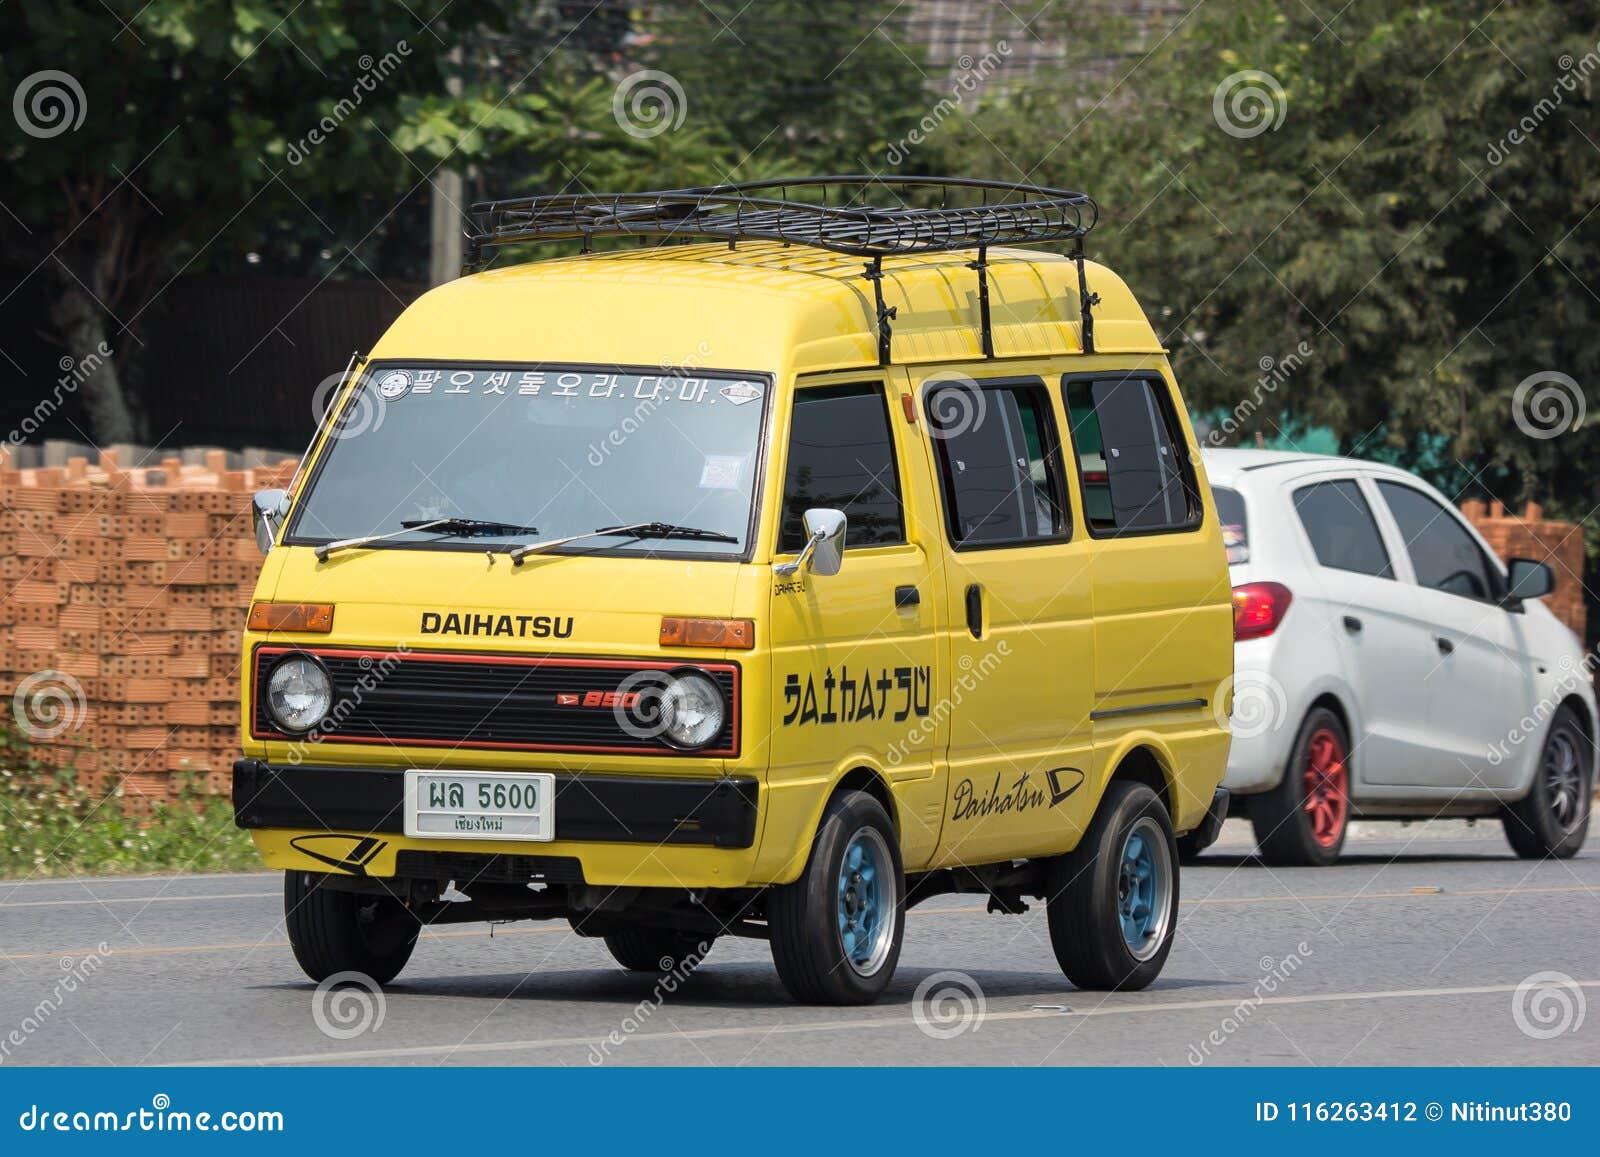 Private Daihatsu Old Van Car Editorial Photography Image Of